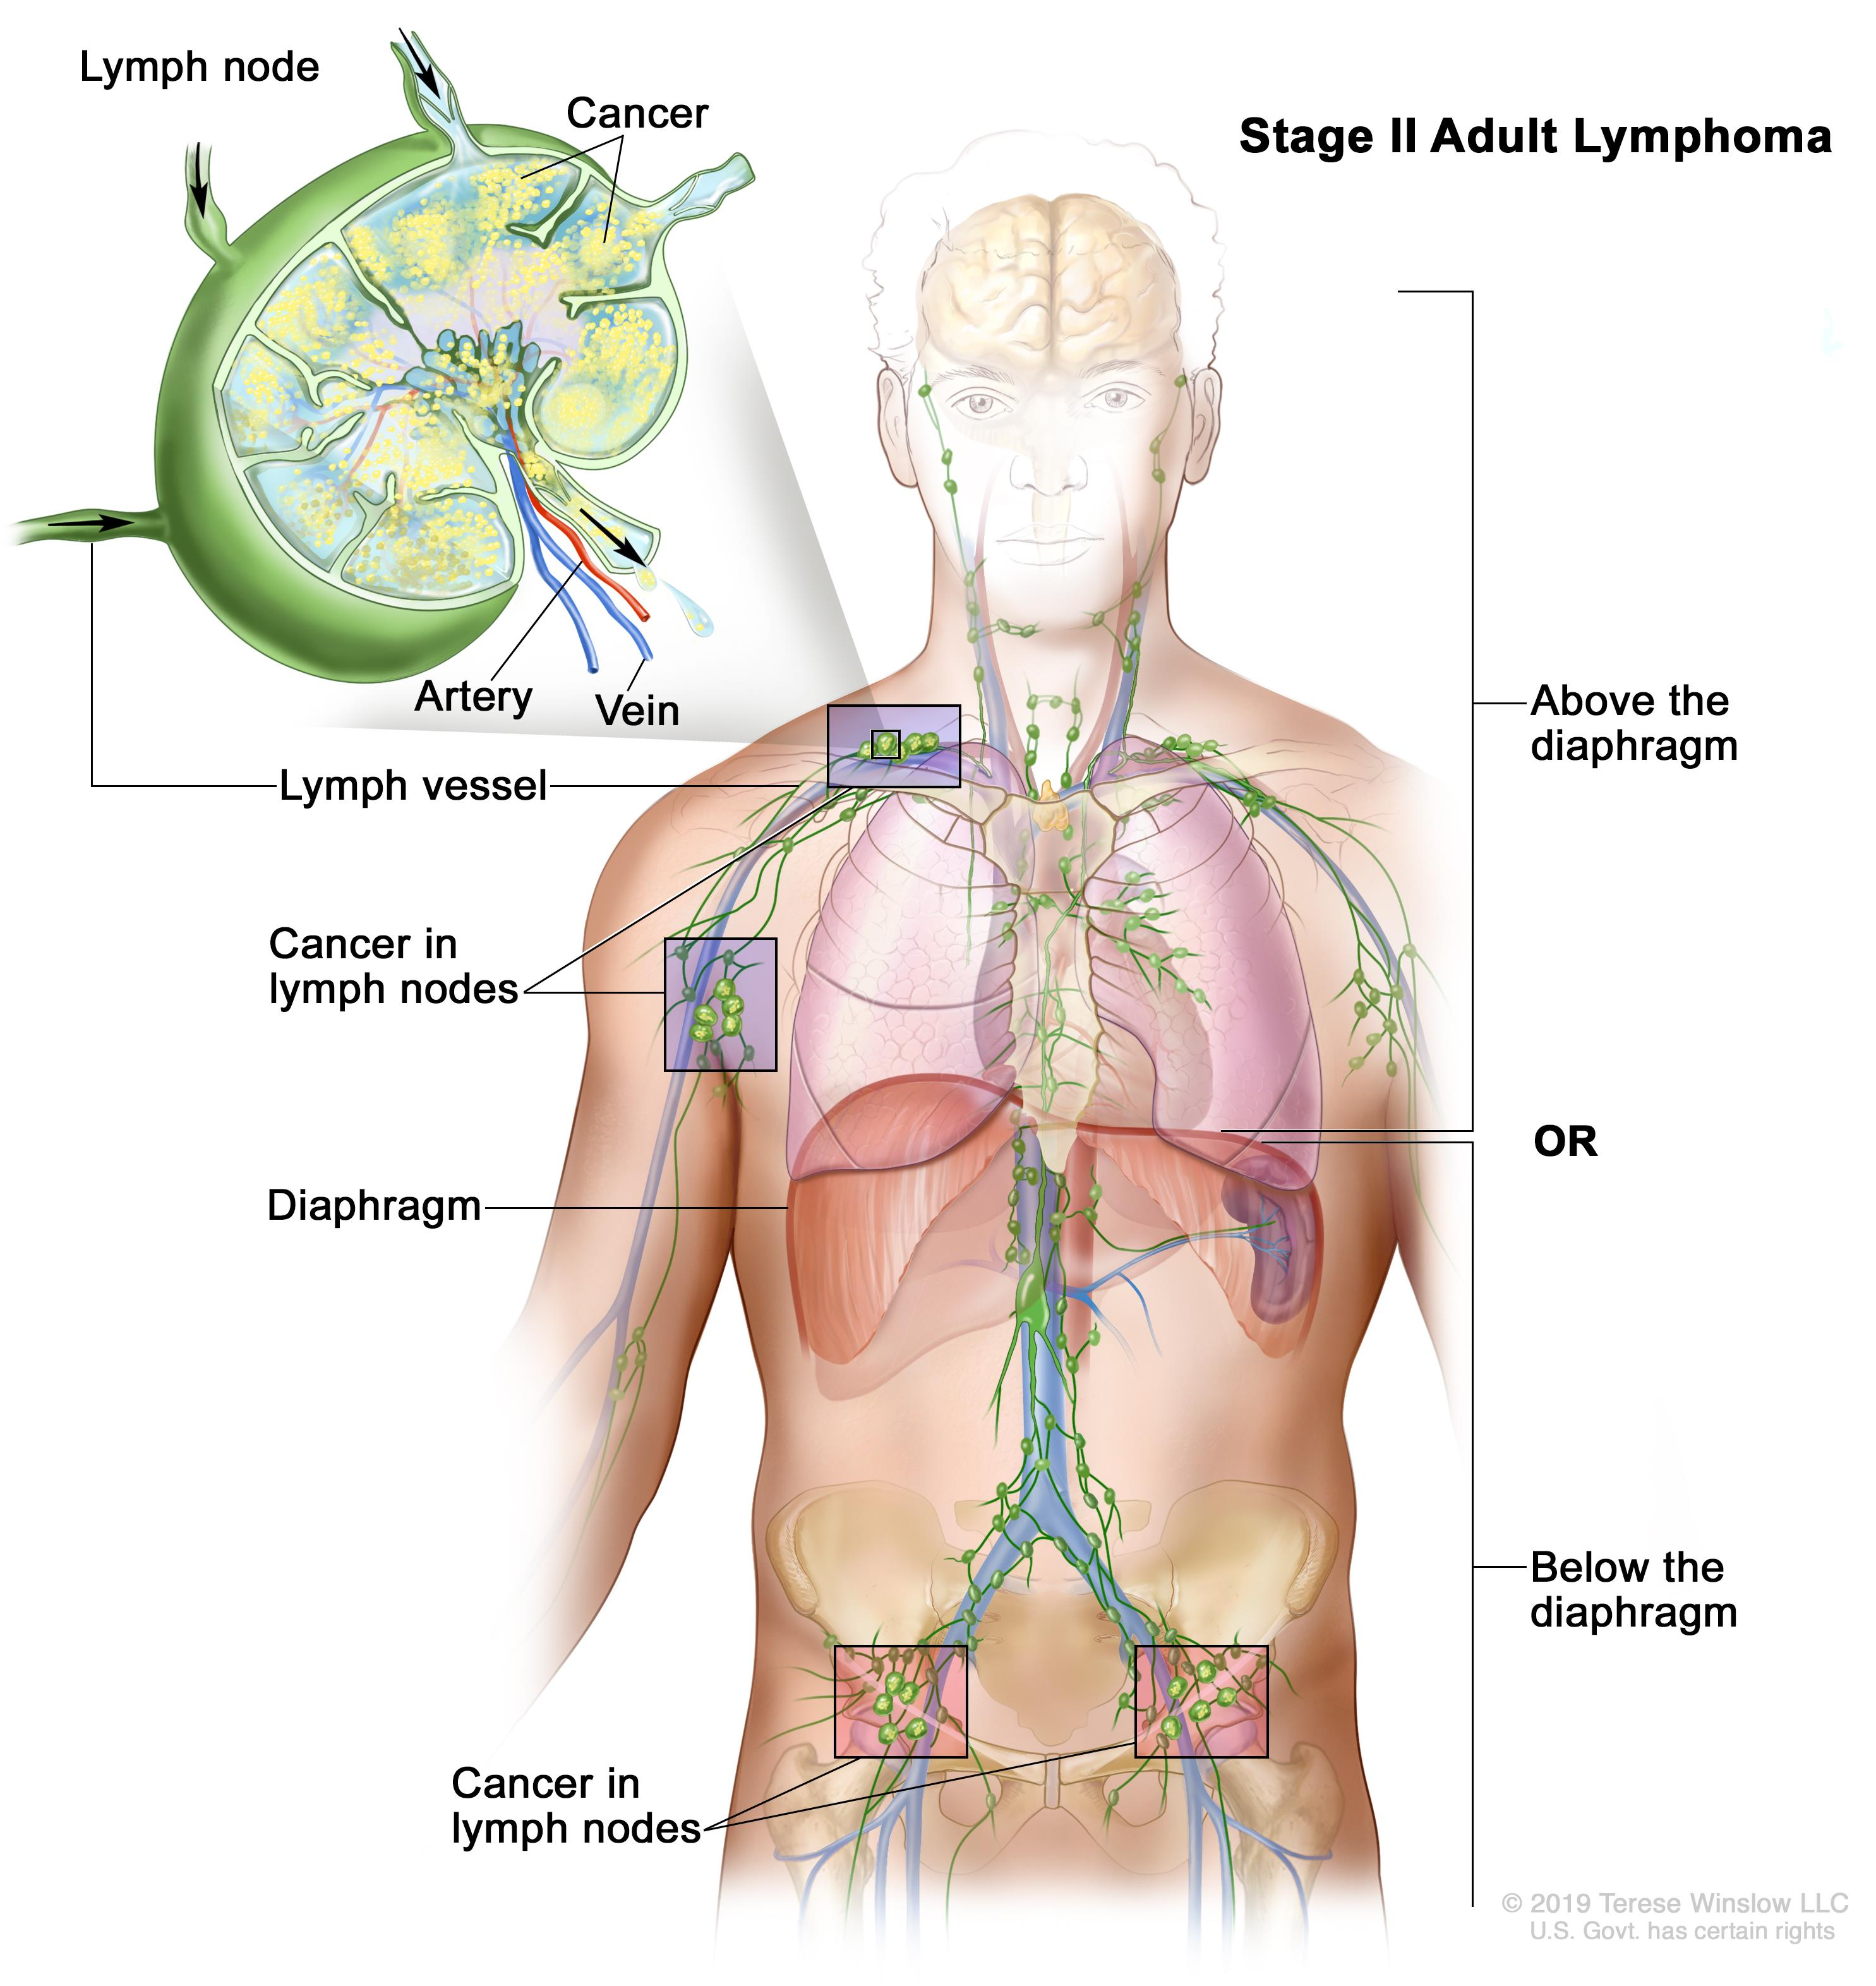 Non-Hodgkin lymphoma: Causes, Symptoms & Risk factors